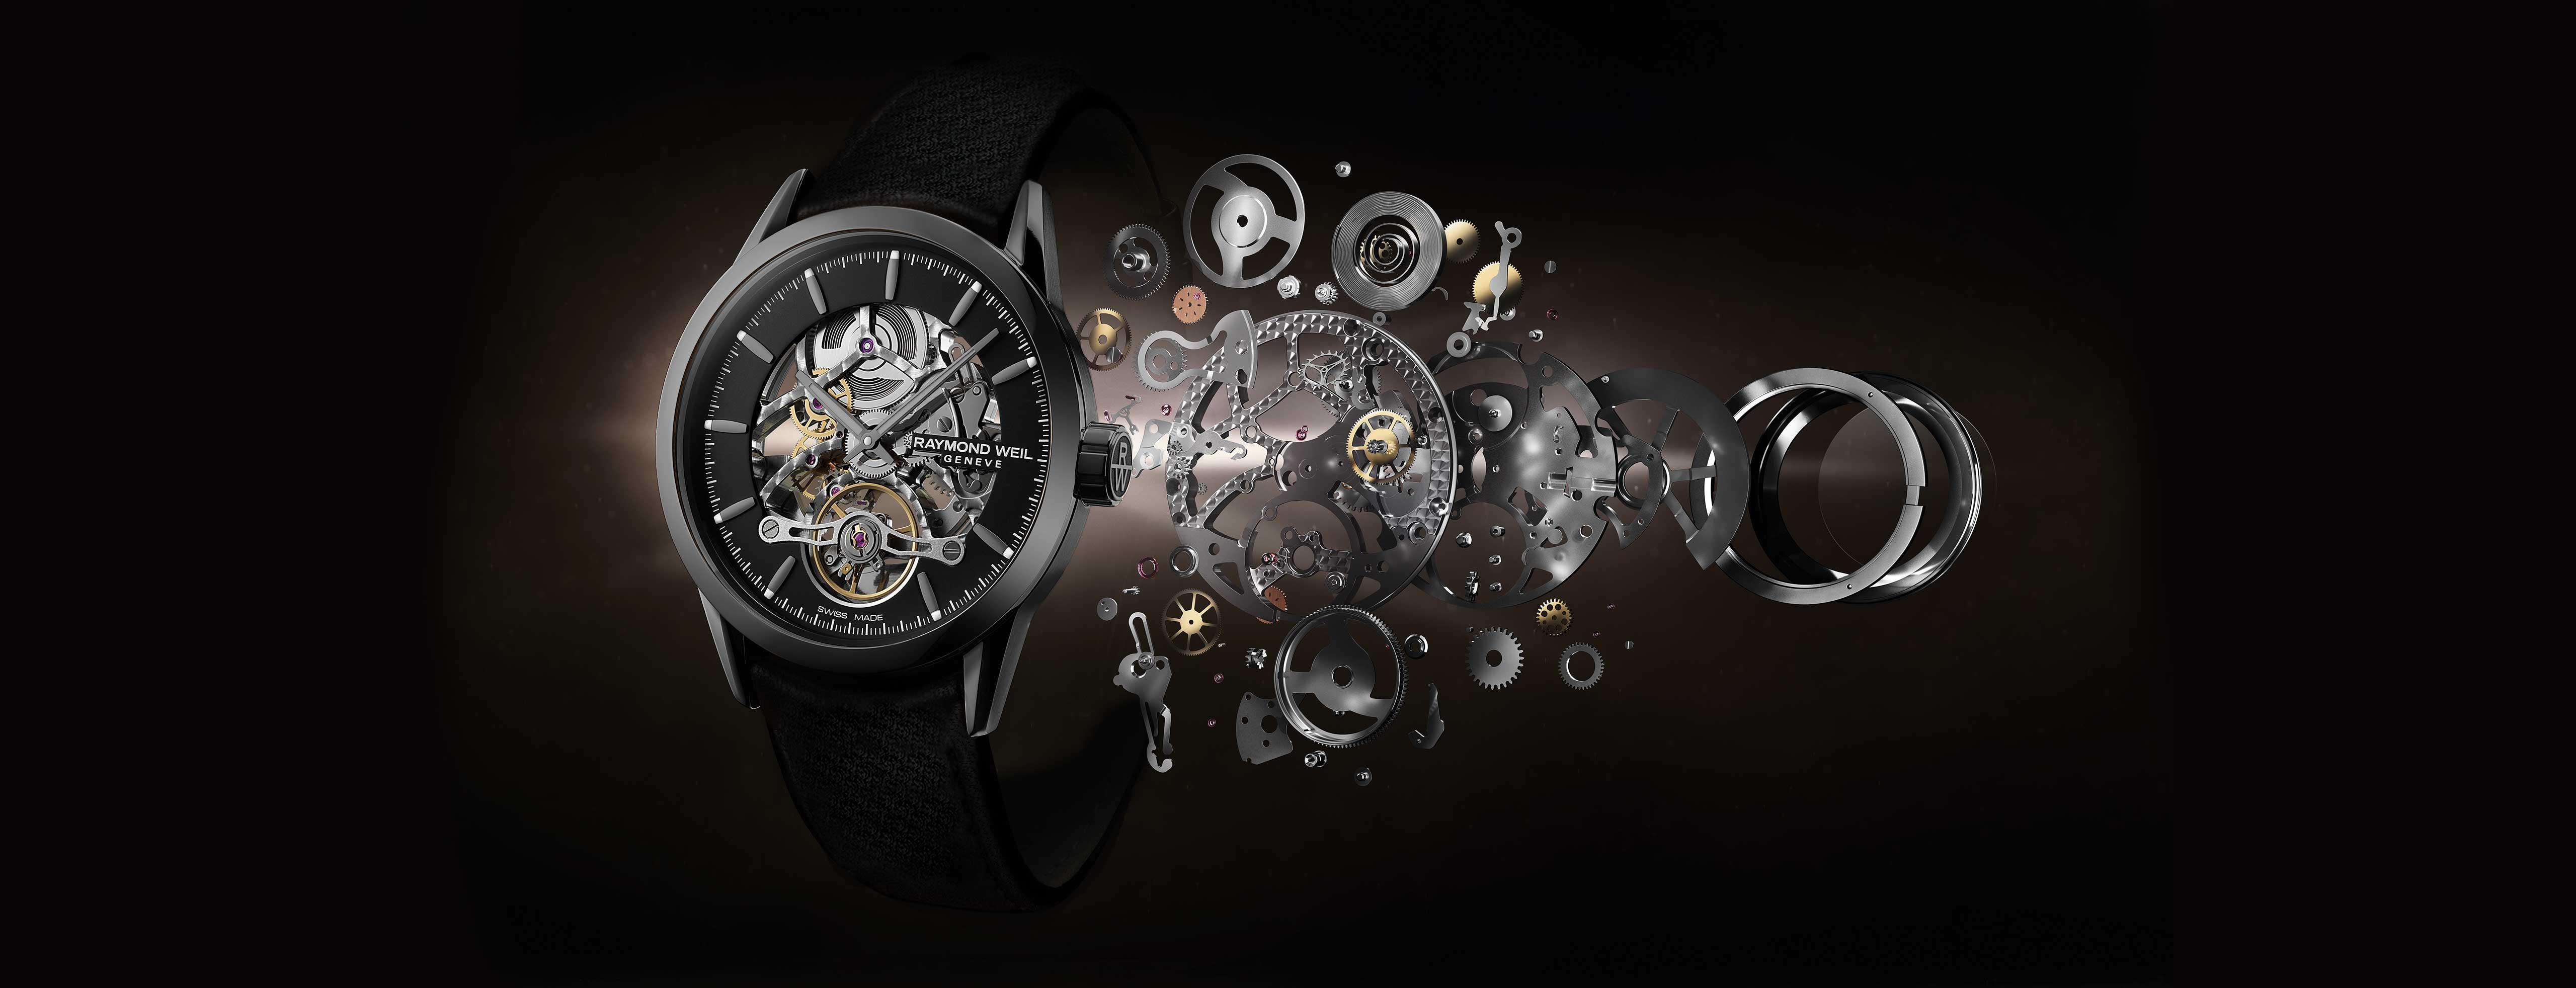 RAYMOND WEIL Men's Limited Edition Freelancer Skeleton Luxury Swiss Watch